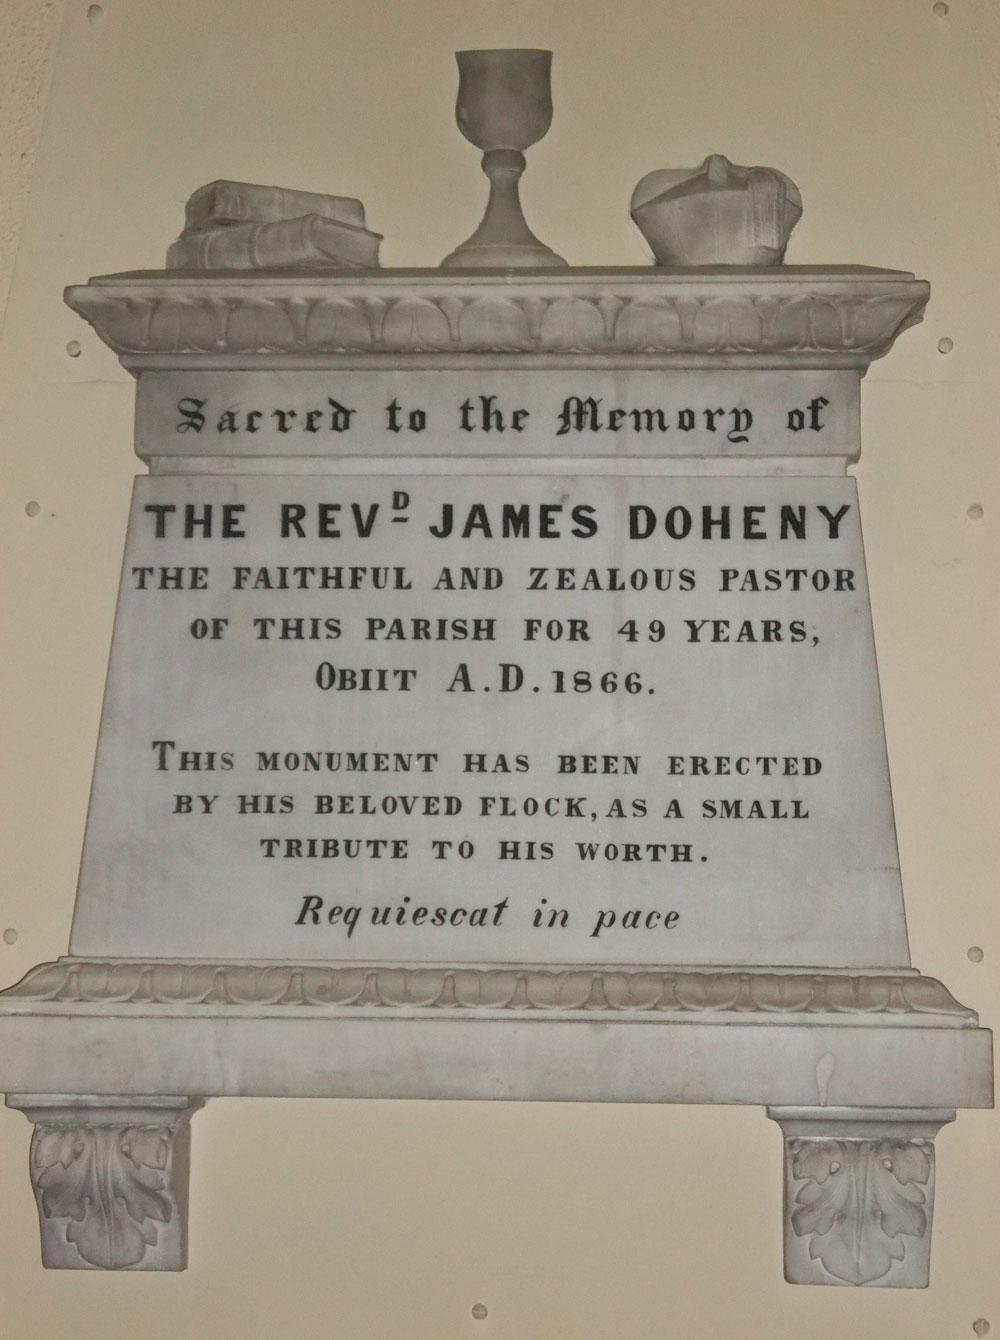 Fr James Doheny – Slieveardagh Rural Development